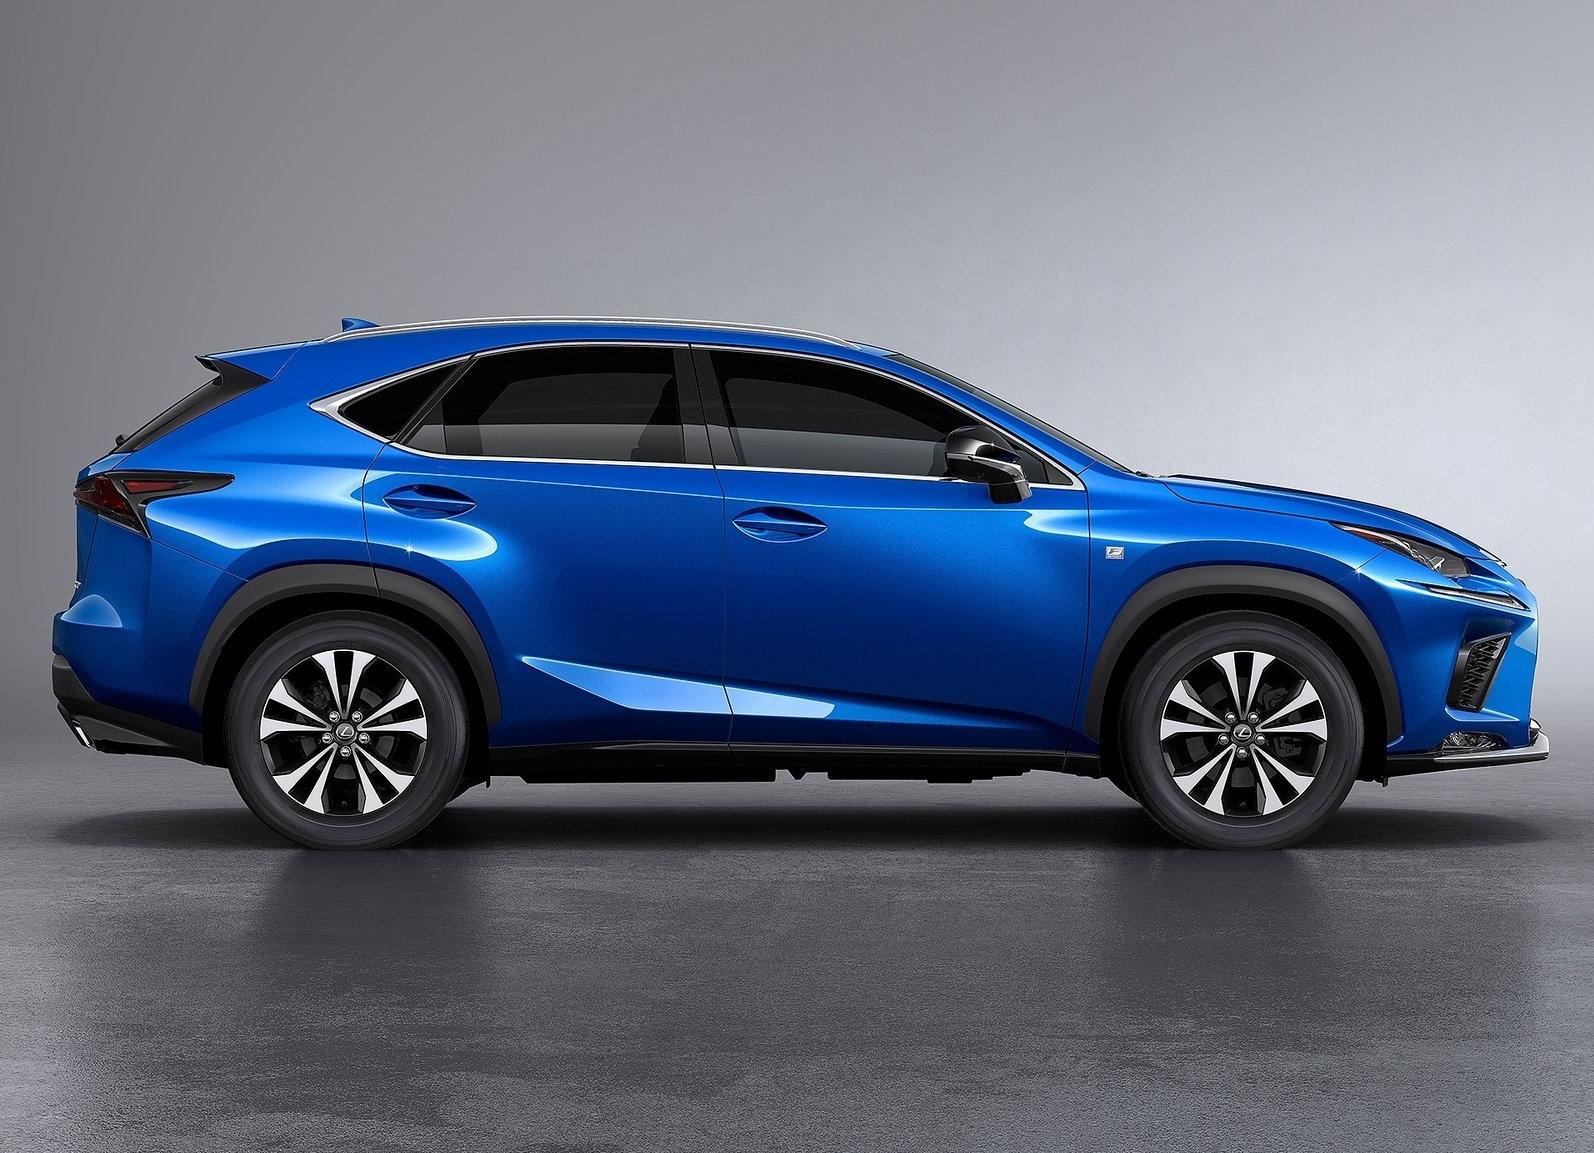 https://www.whatcar.lv/cars/Lexus/NX/e450650e9fba5eb5bf5d06b96c339c8d.jpg